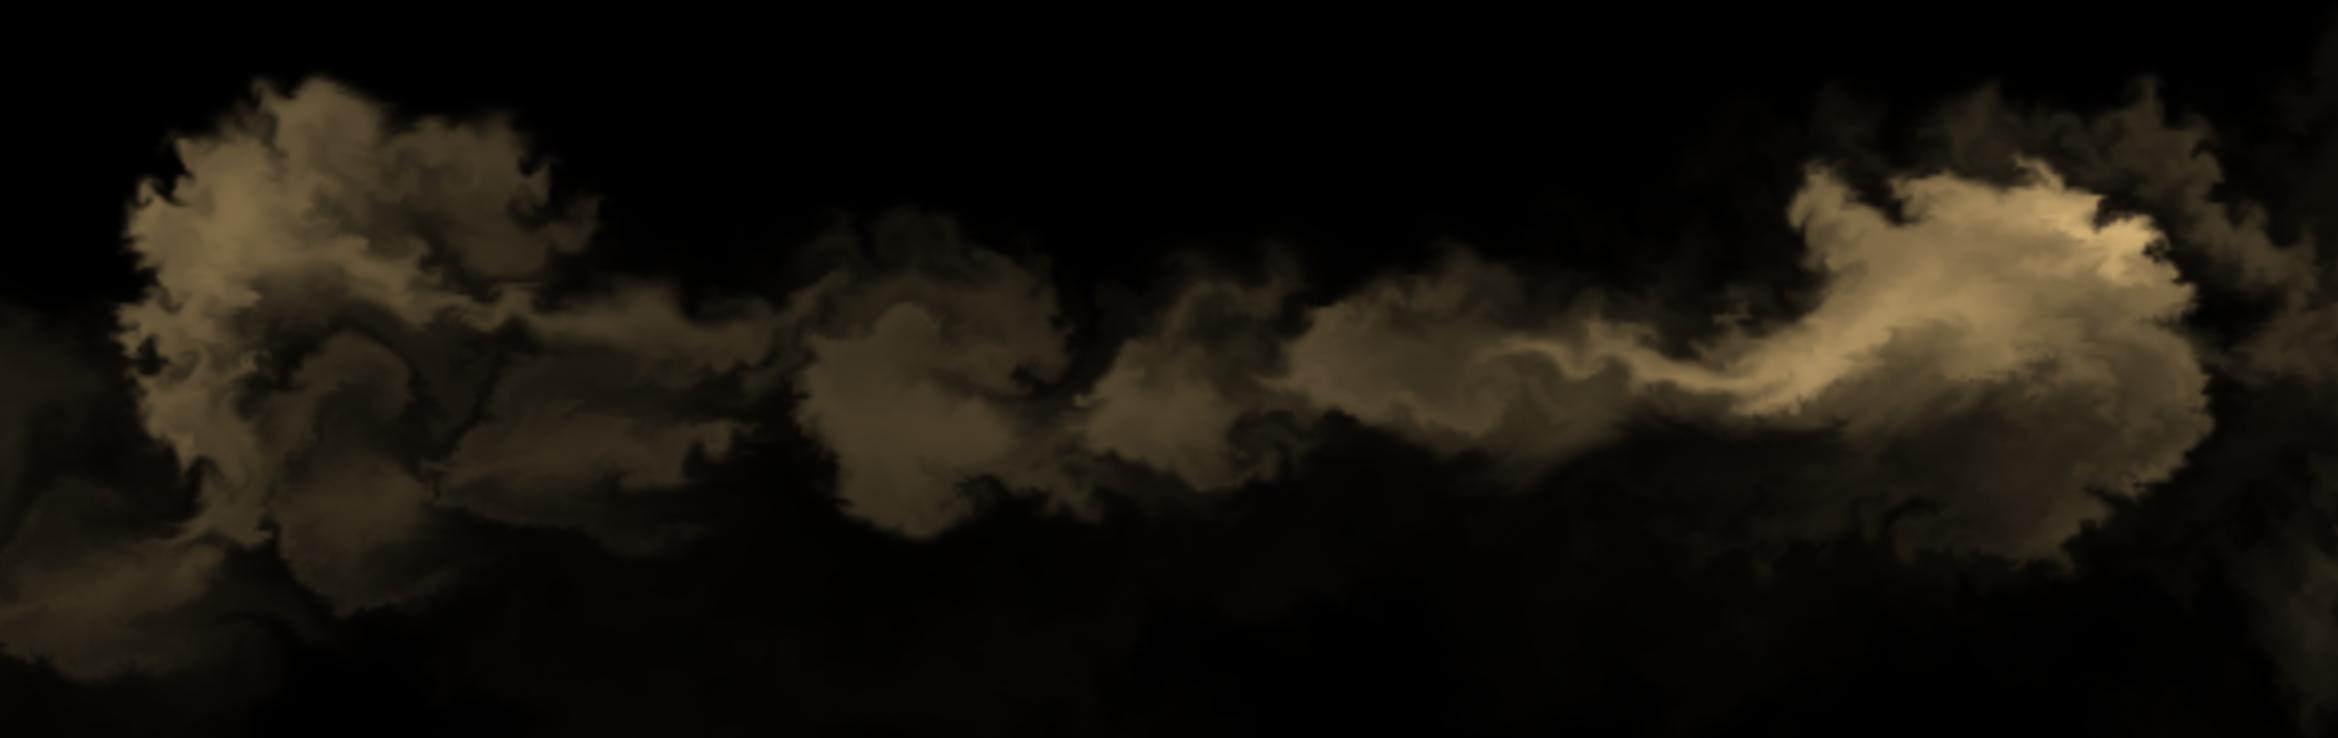 WebGL fluid simulation   Visualization ideas